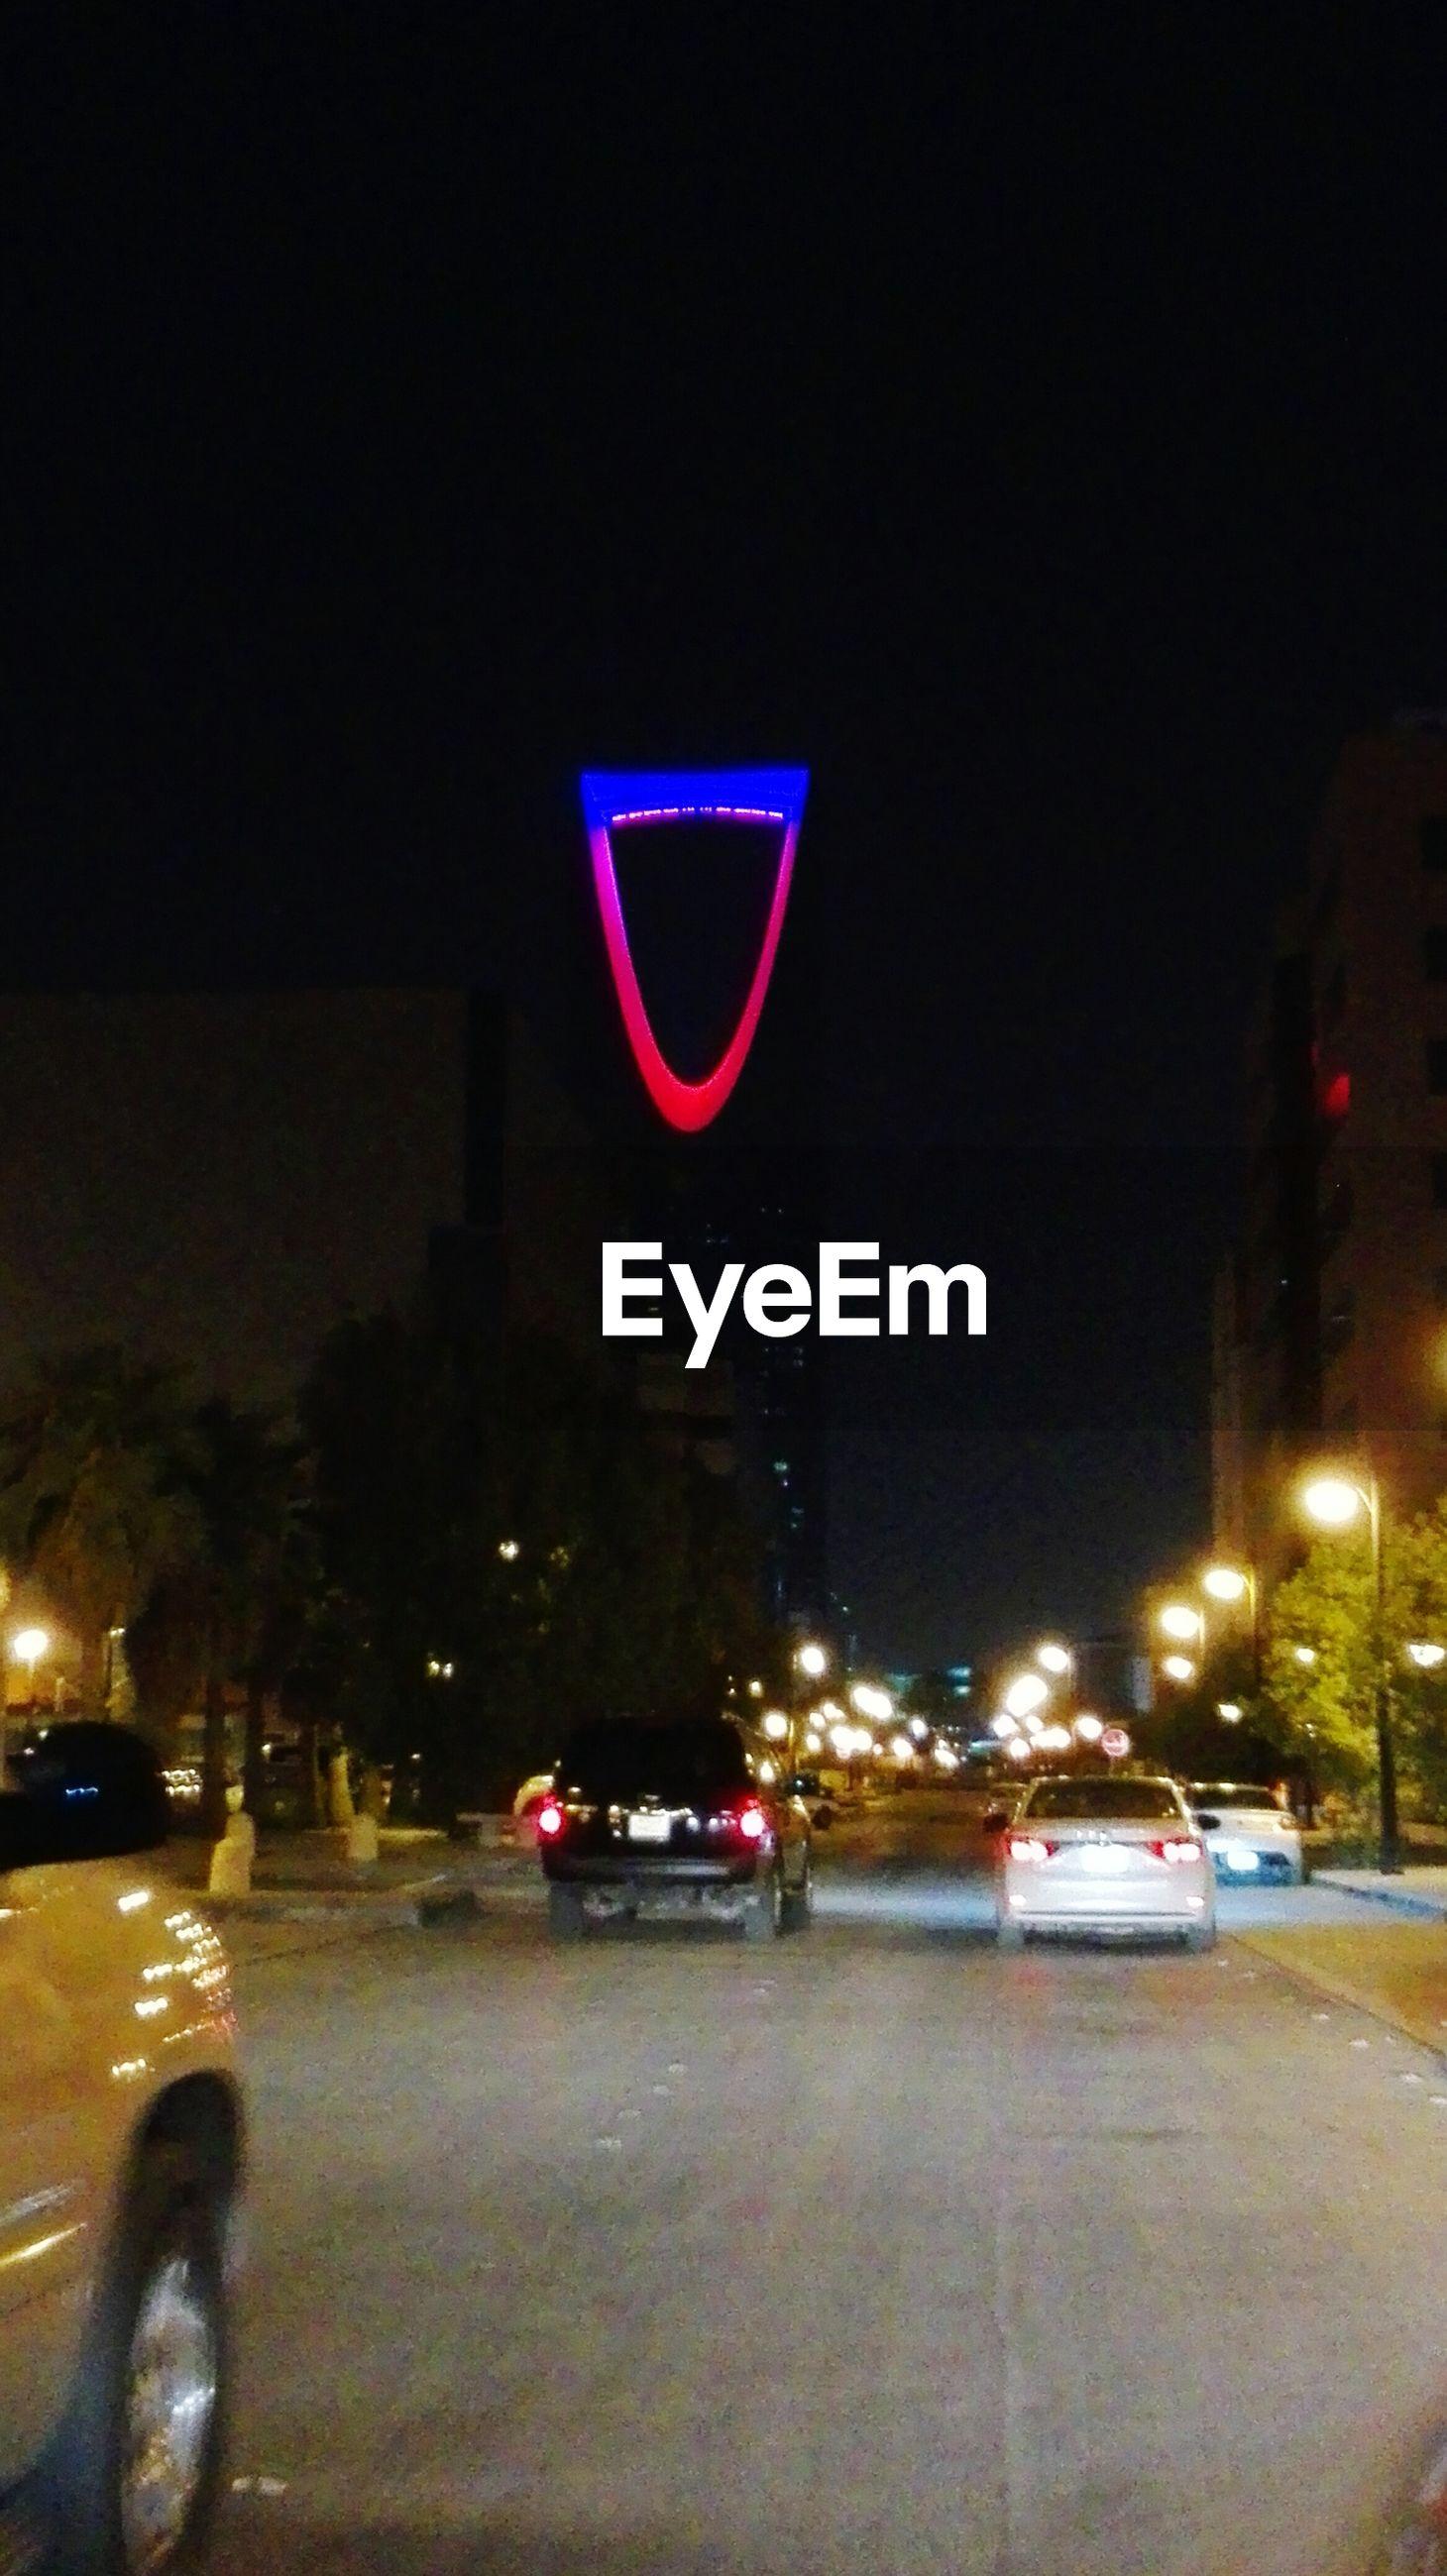 transportation, night, illuminated, land vehicle, mode of transport, road, traffic, motion, city, red, headlight, no people, city street, outdoors, city life, sky